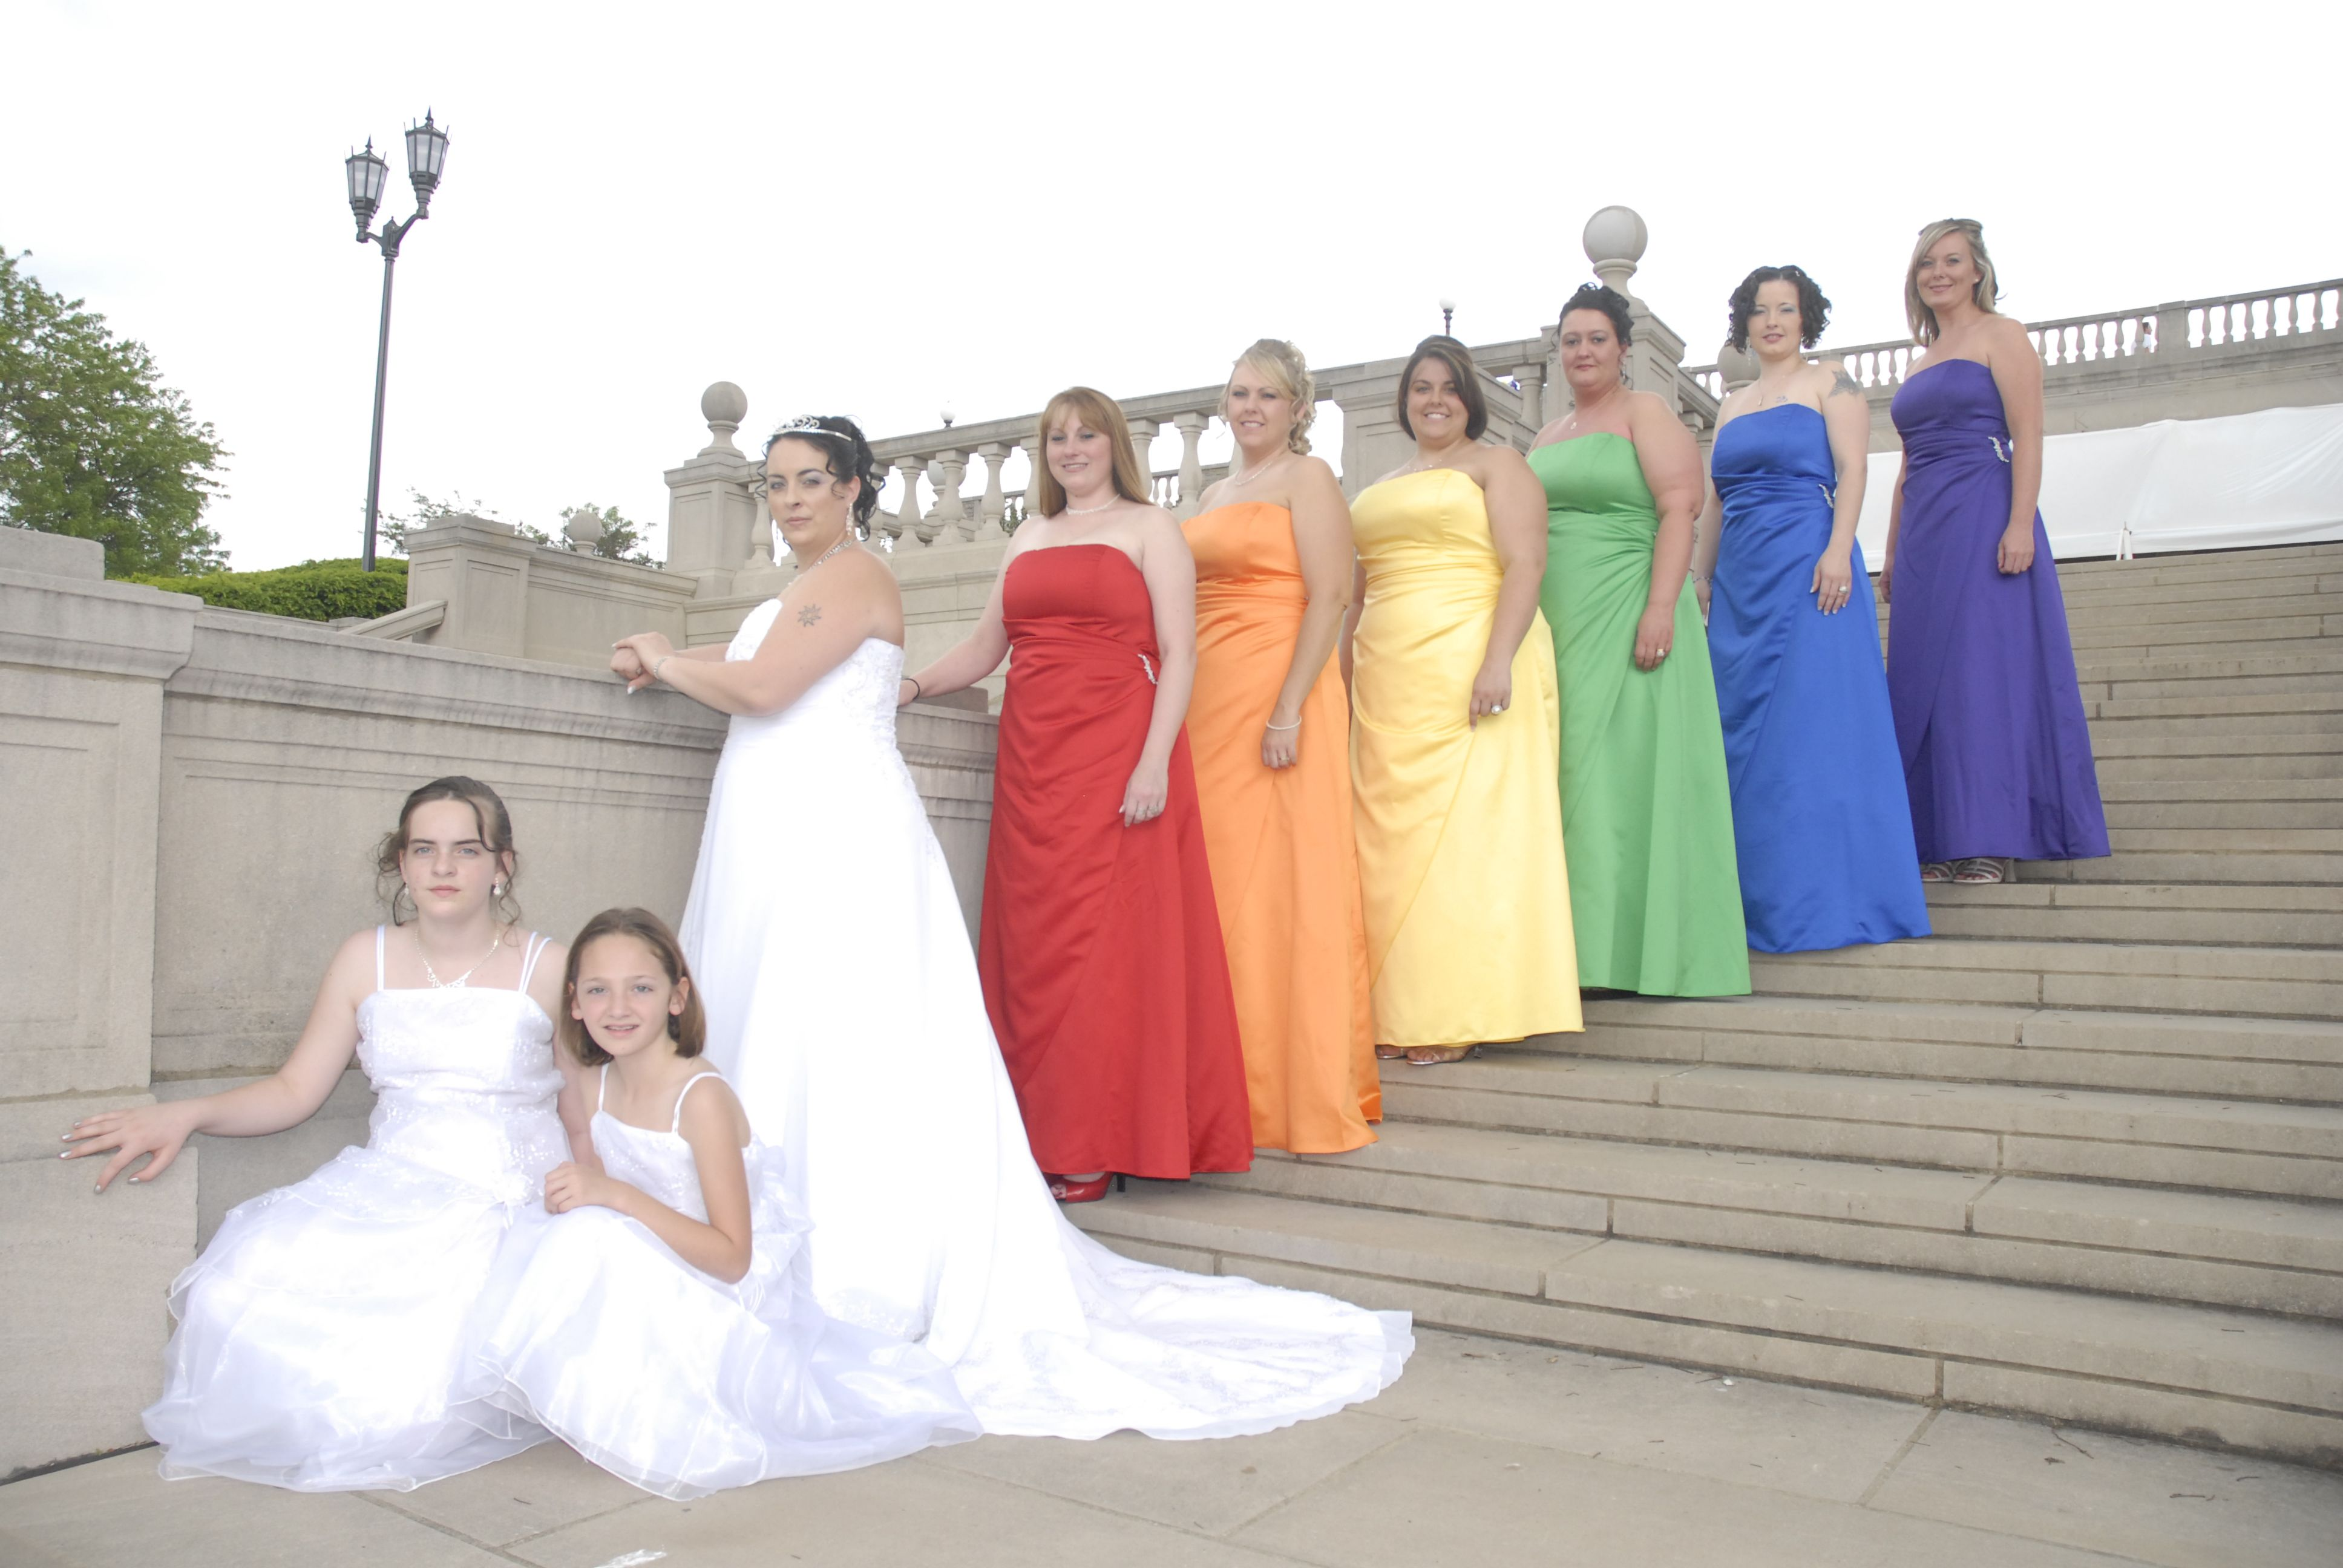 lesbian wedding ideas Lesbian weddings well I like the idea I m not a lesbian